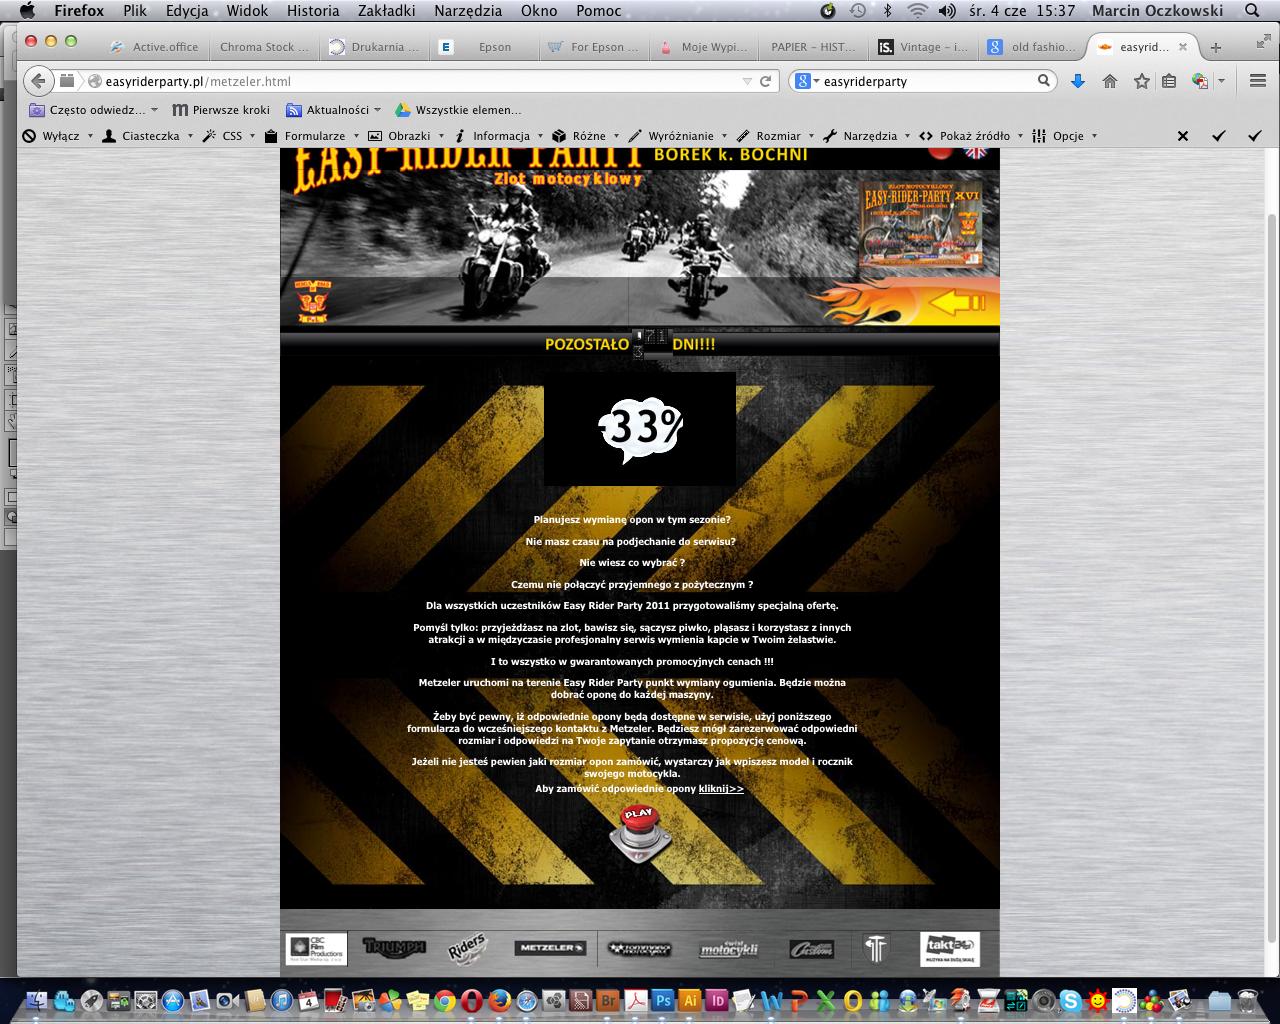 Zrzut ekranu 2014-06-4 o 15.37.34